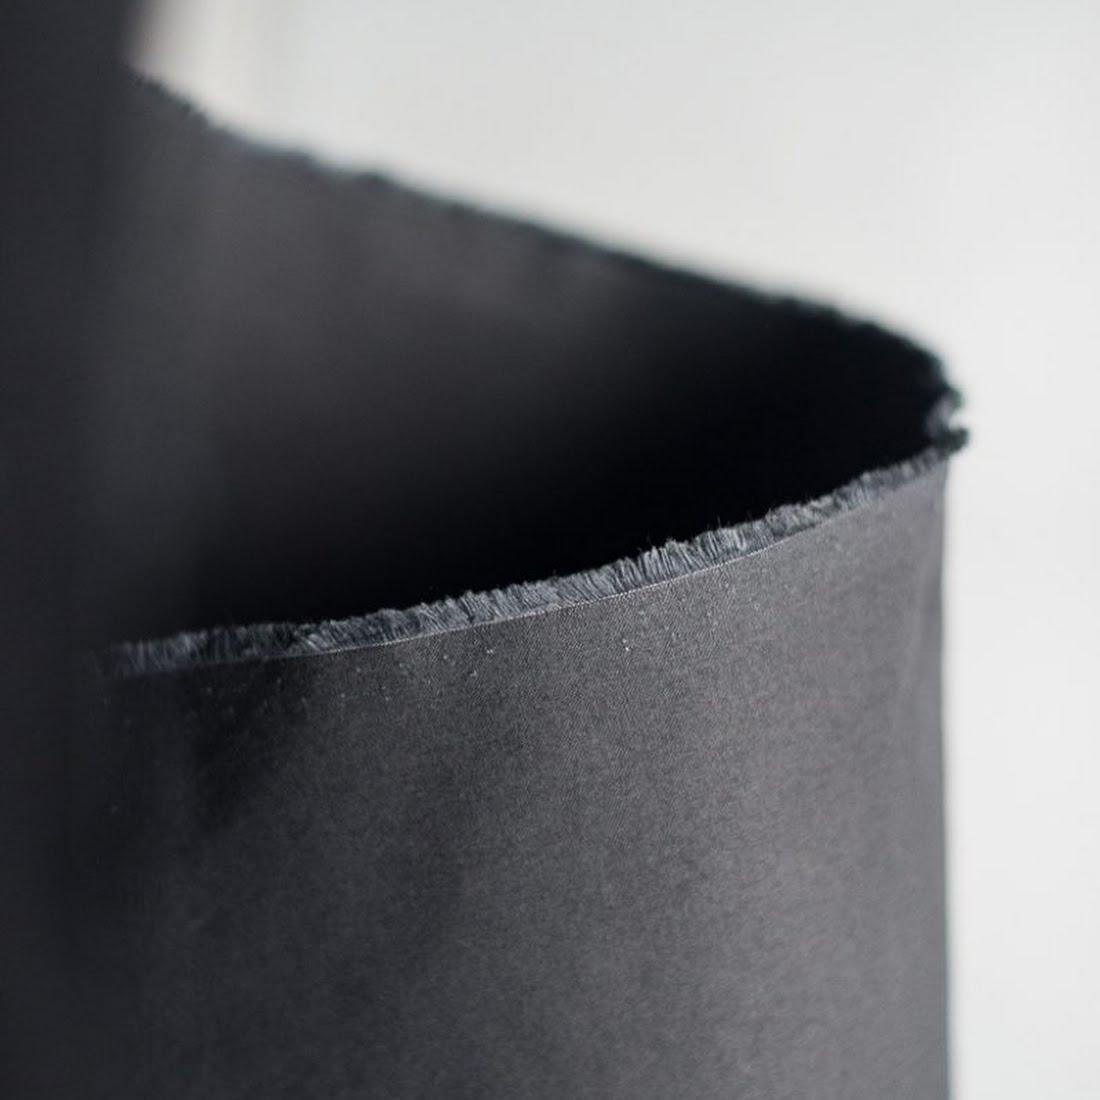 Dry Oilskin - Dry Oilskin BLACK